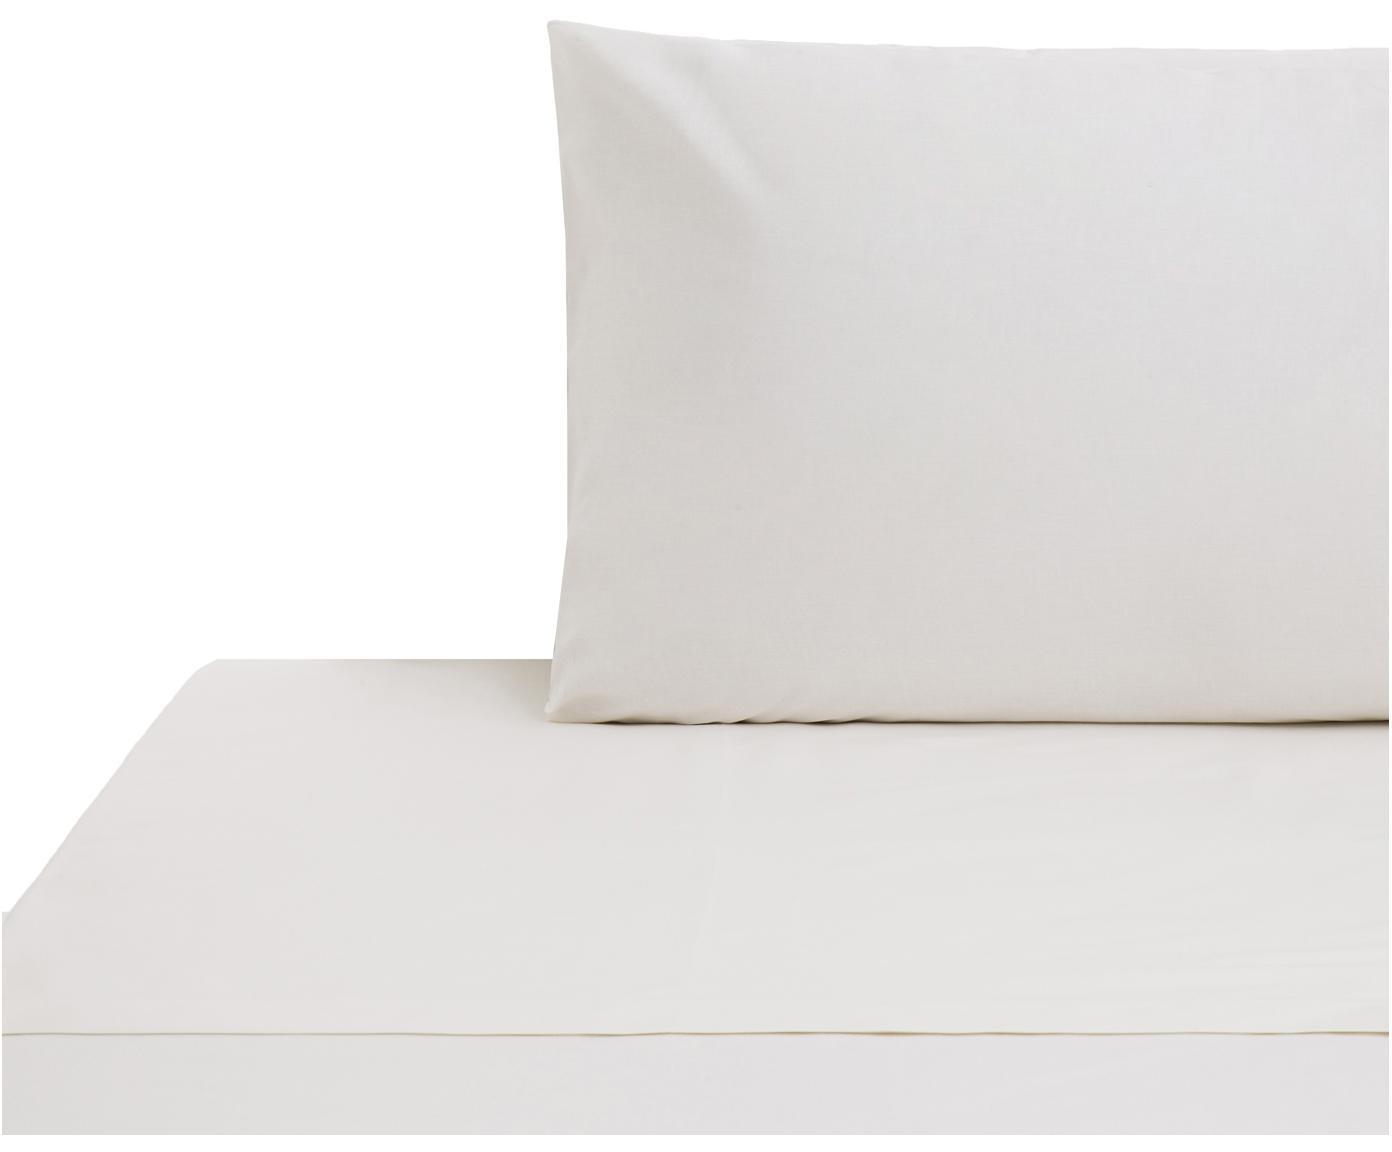 Set lenzuola in cotone ranforce Lenare 2 pz, Tessuto: Renforcé, Fronte e retro: avorio chiaro, 150 x 290 cm